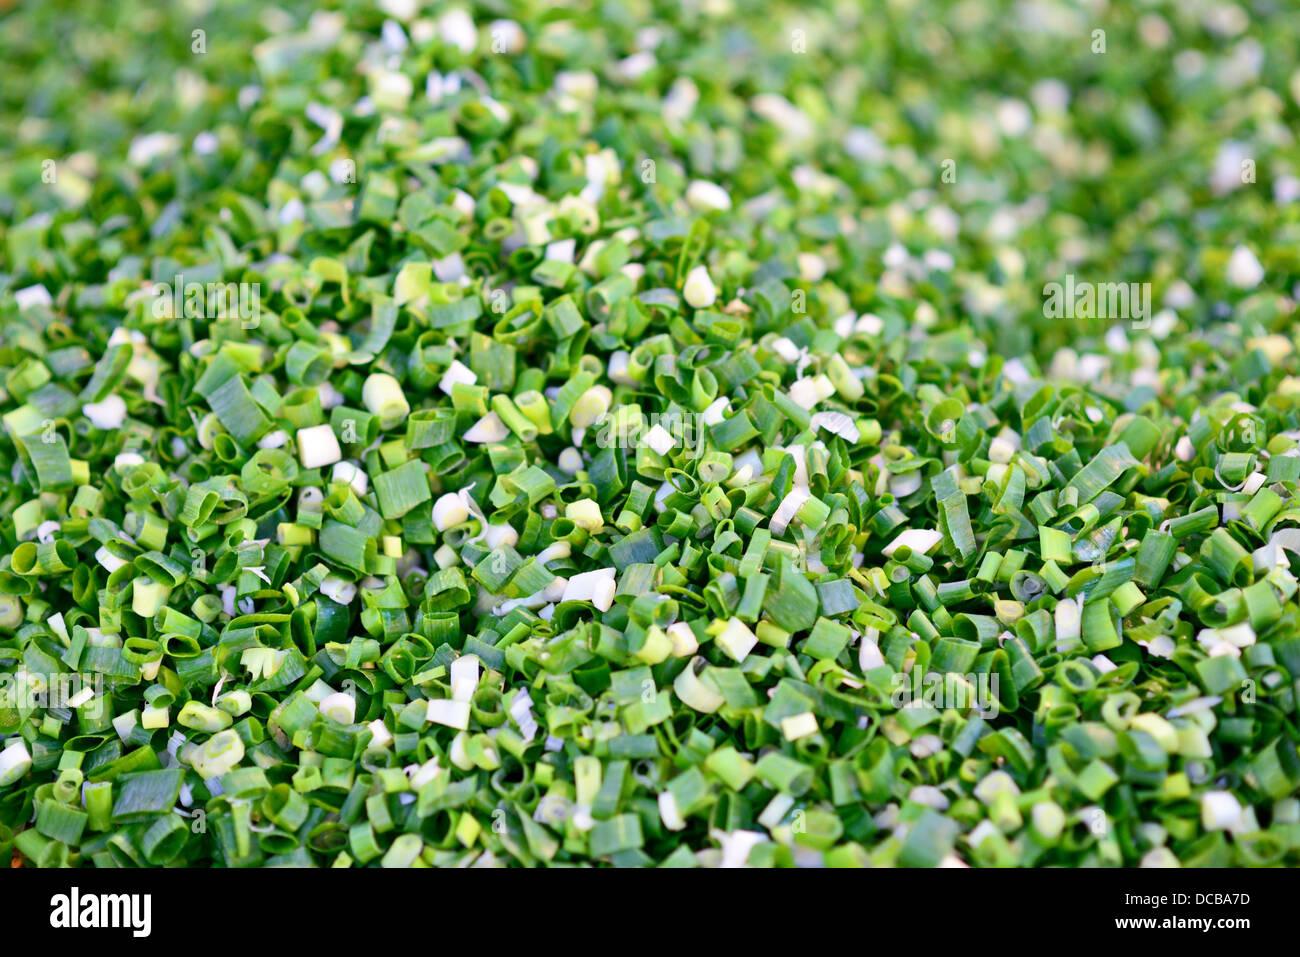 Fresh pile of diced leek onion - Stock Image